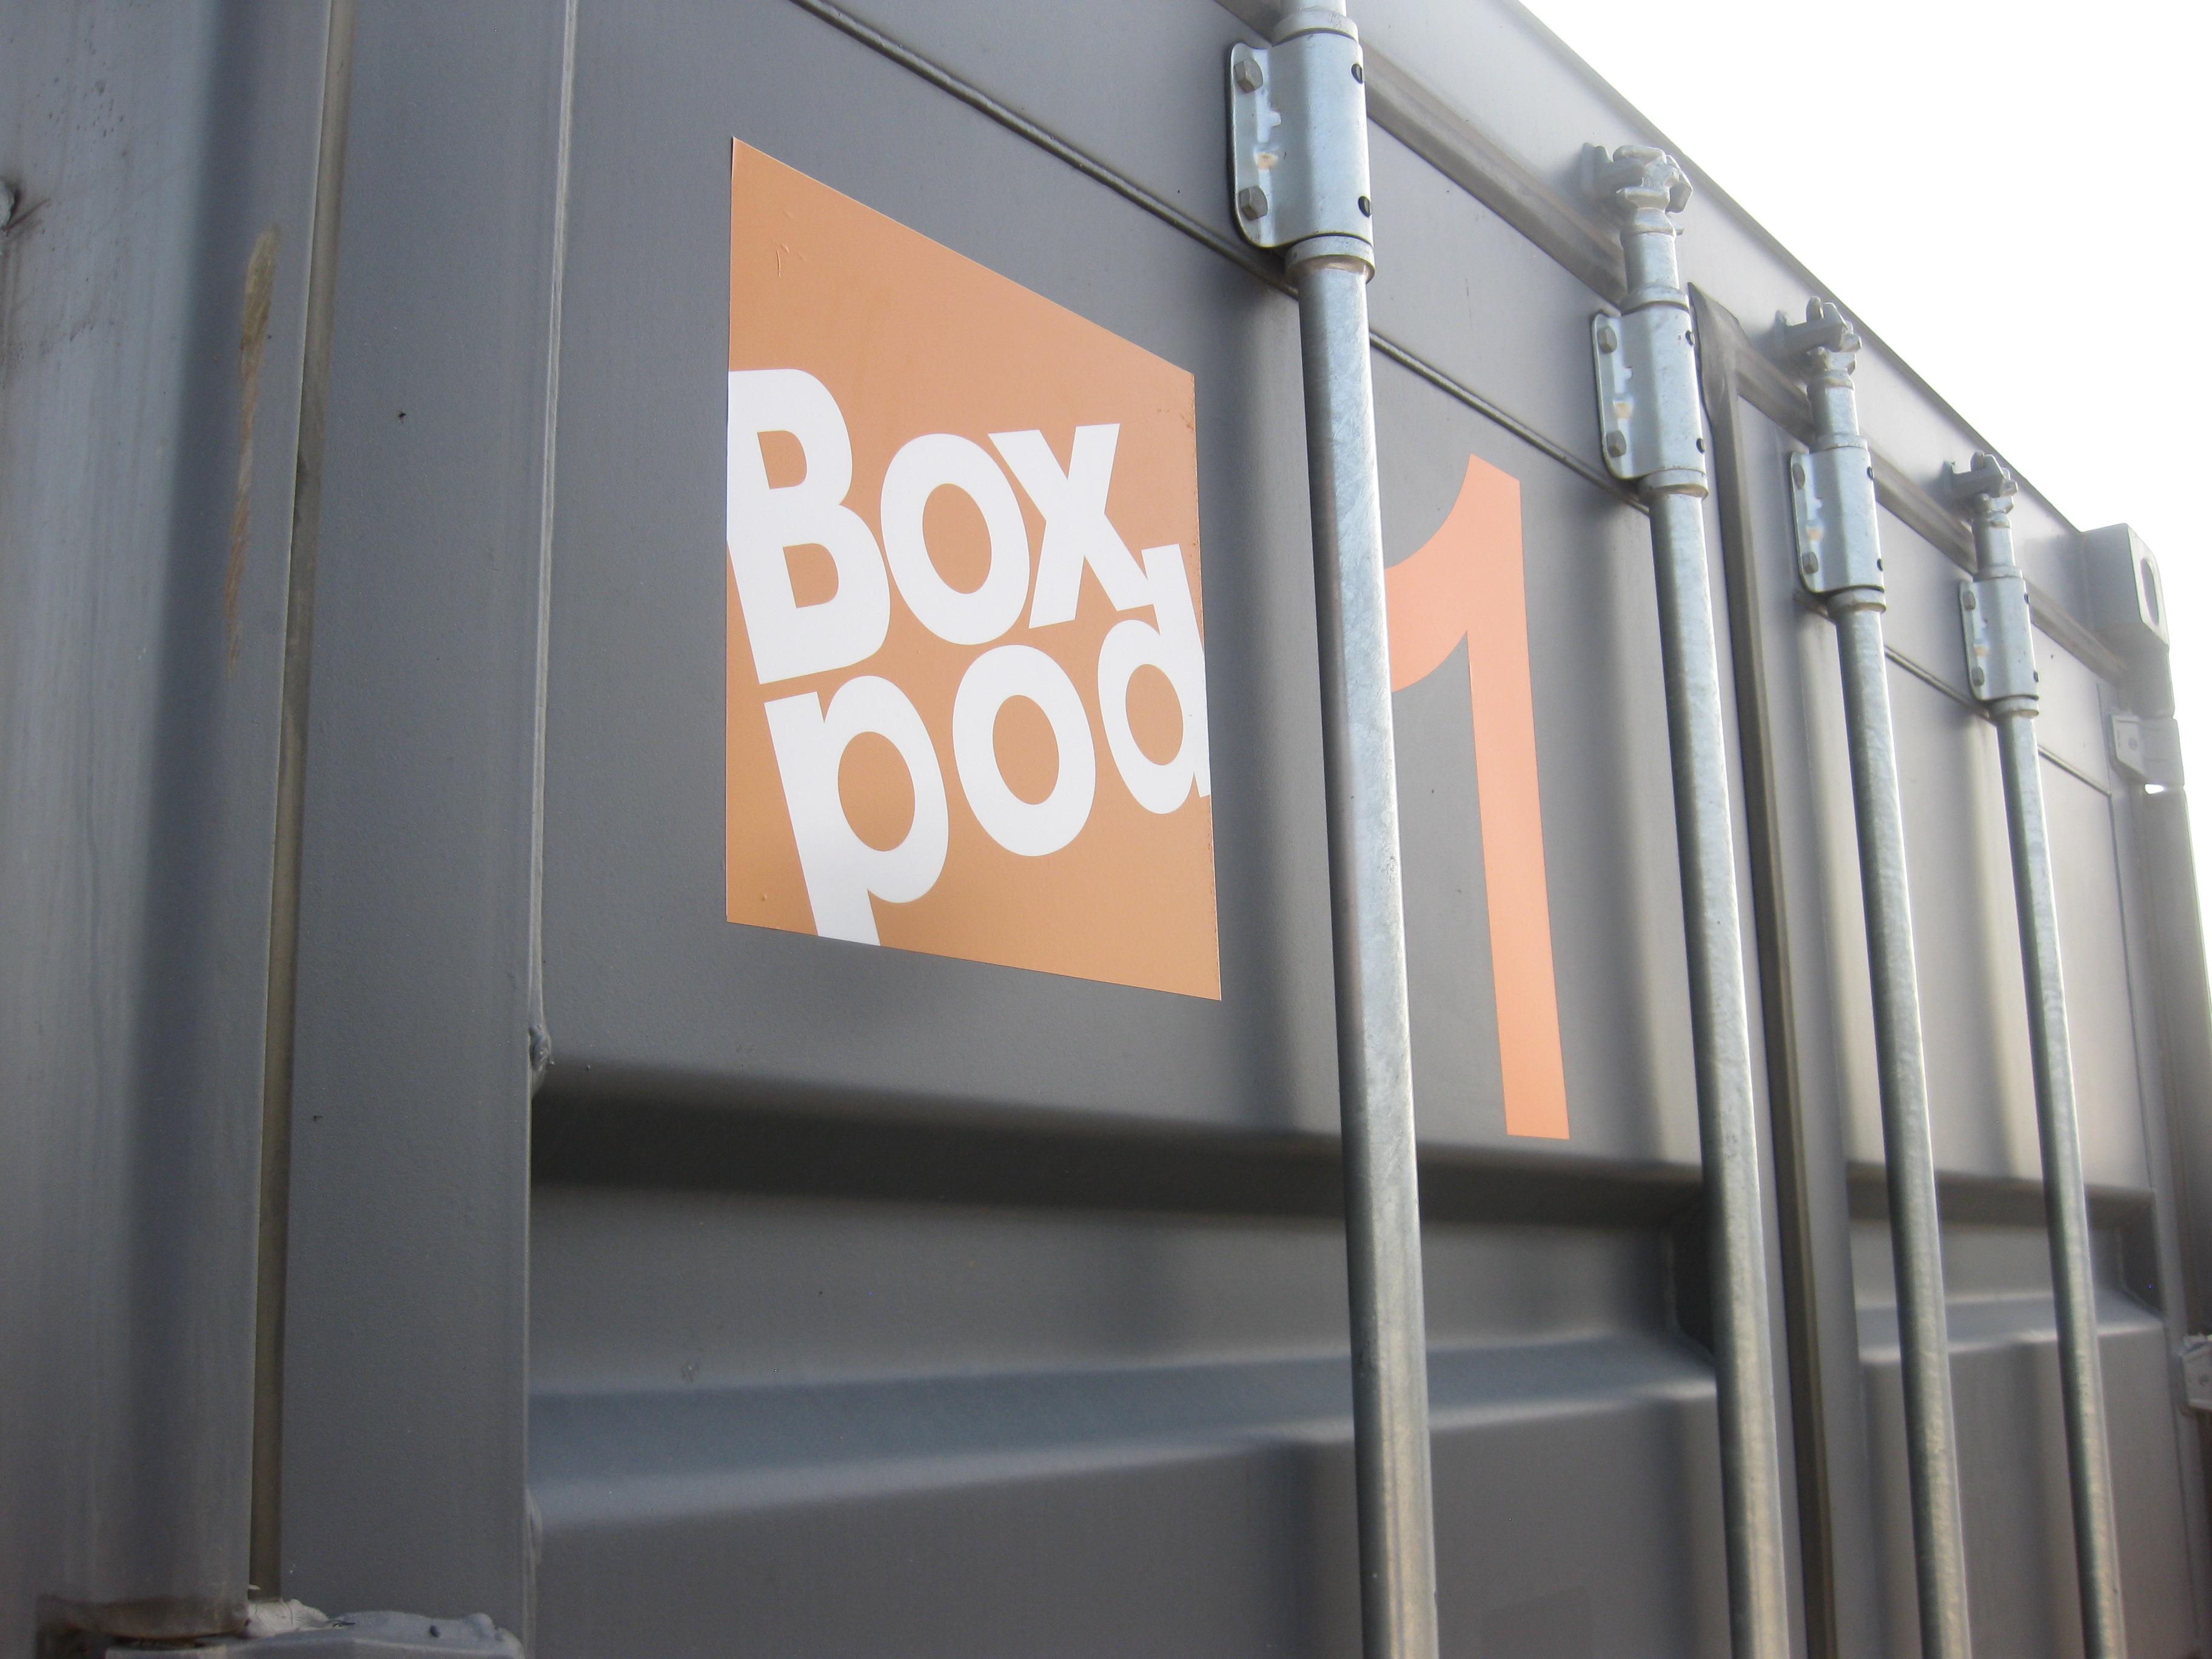 box-pod-space-container